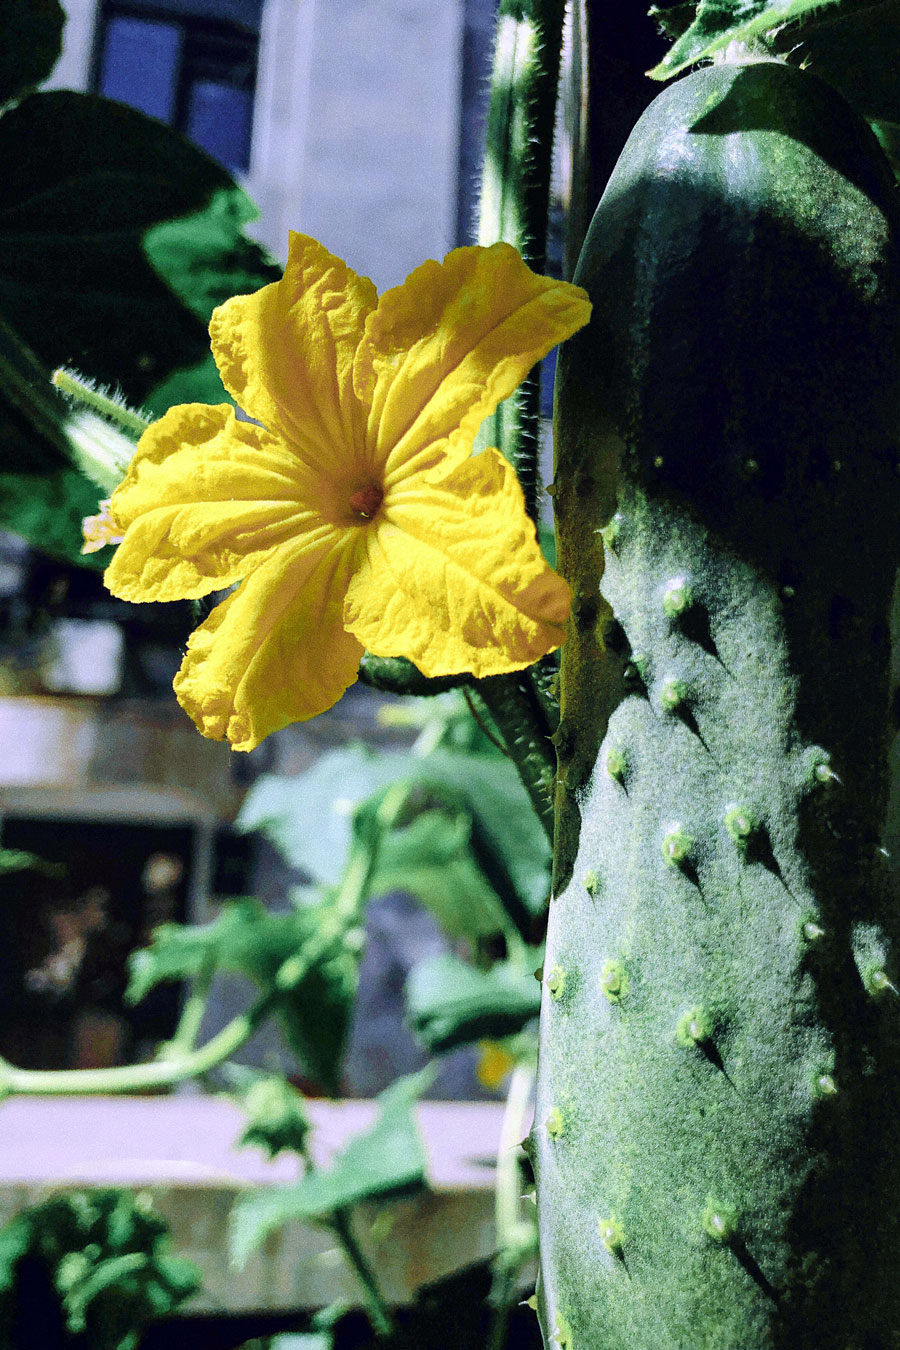 How to grow organic cucumbers | Growing cucumbers in your kitchen garden